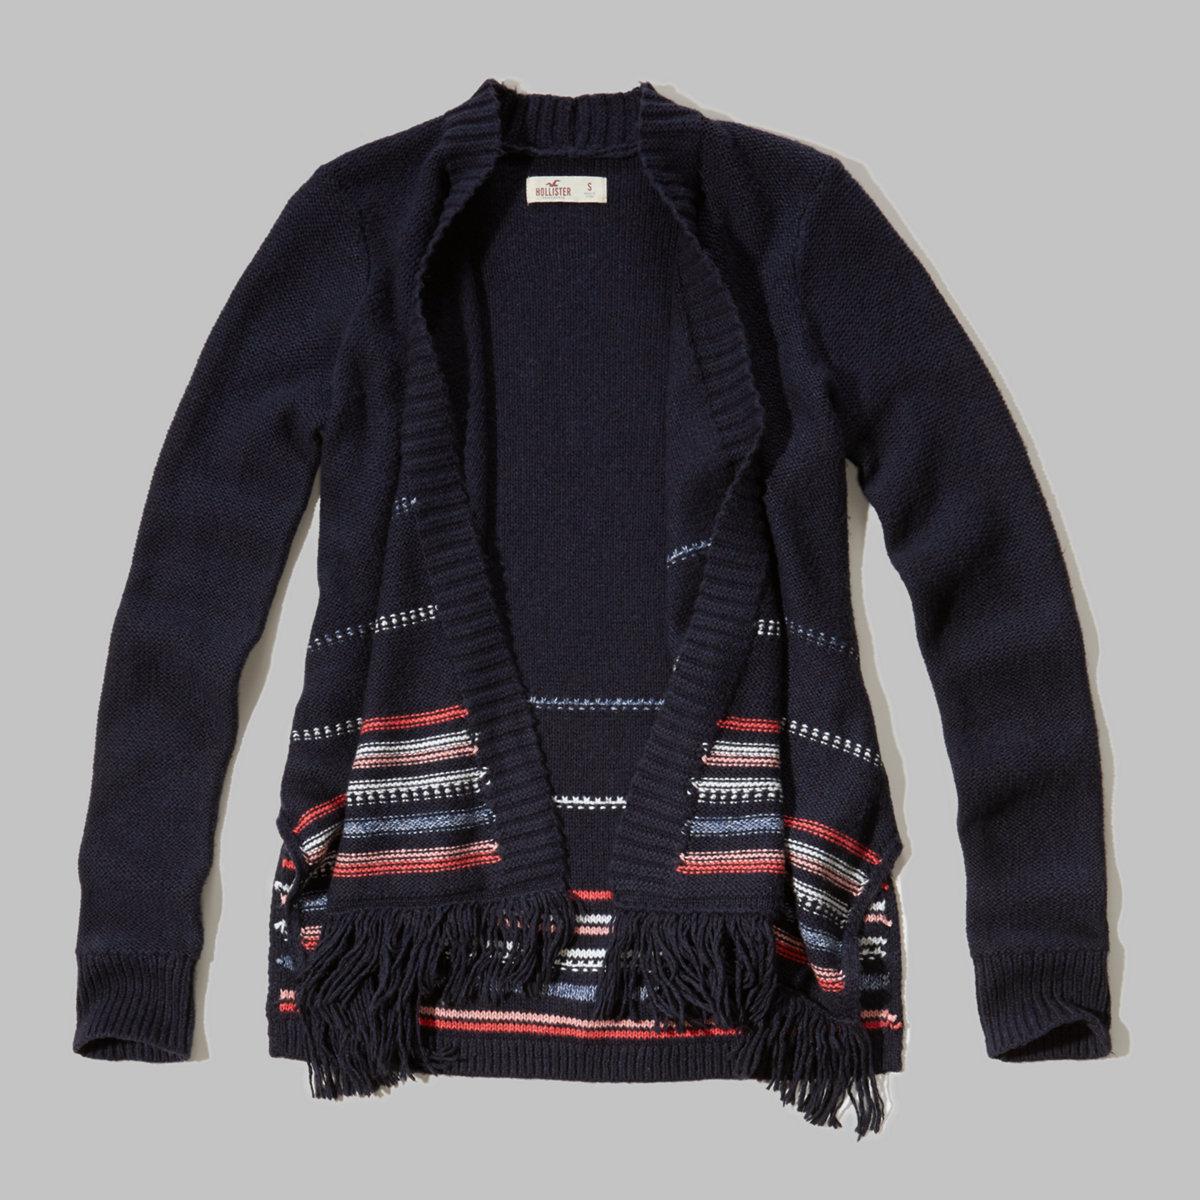 Fringe Blanket Sweater